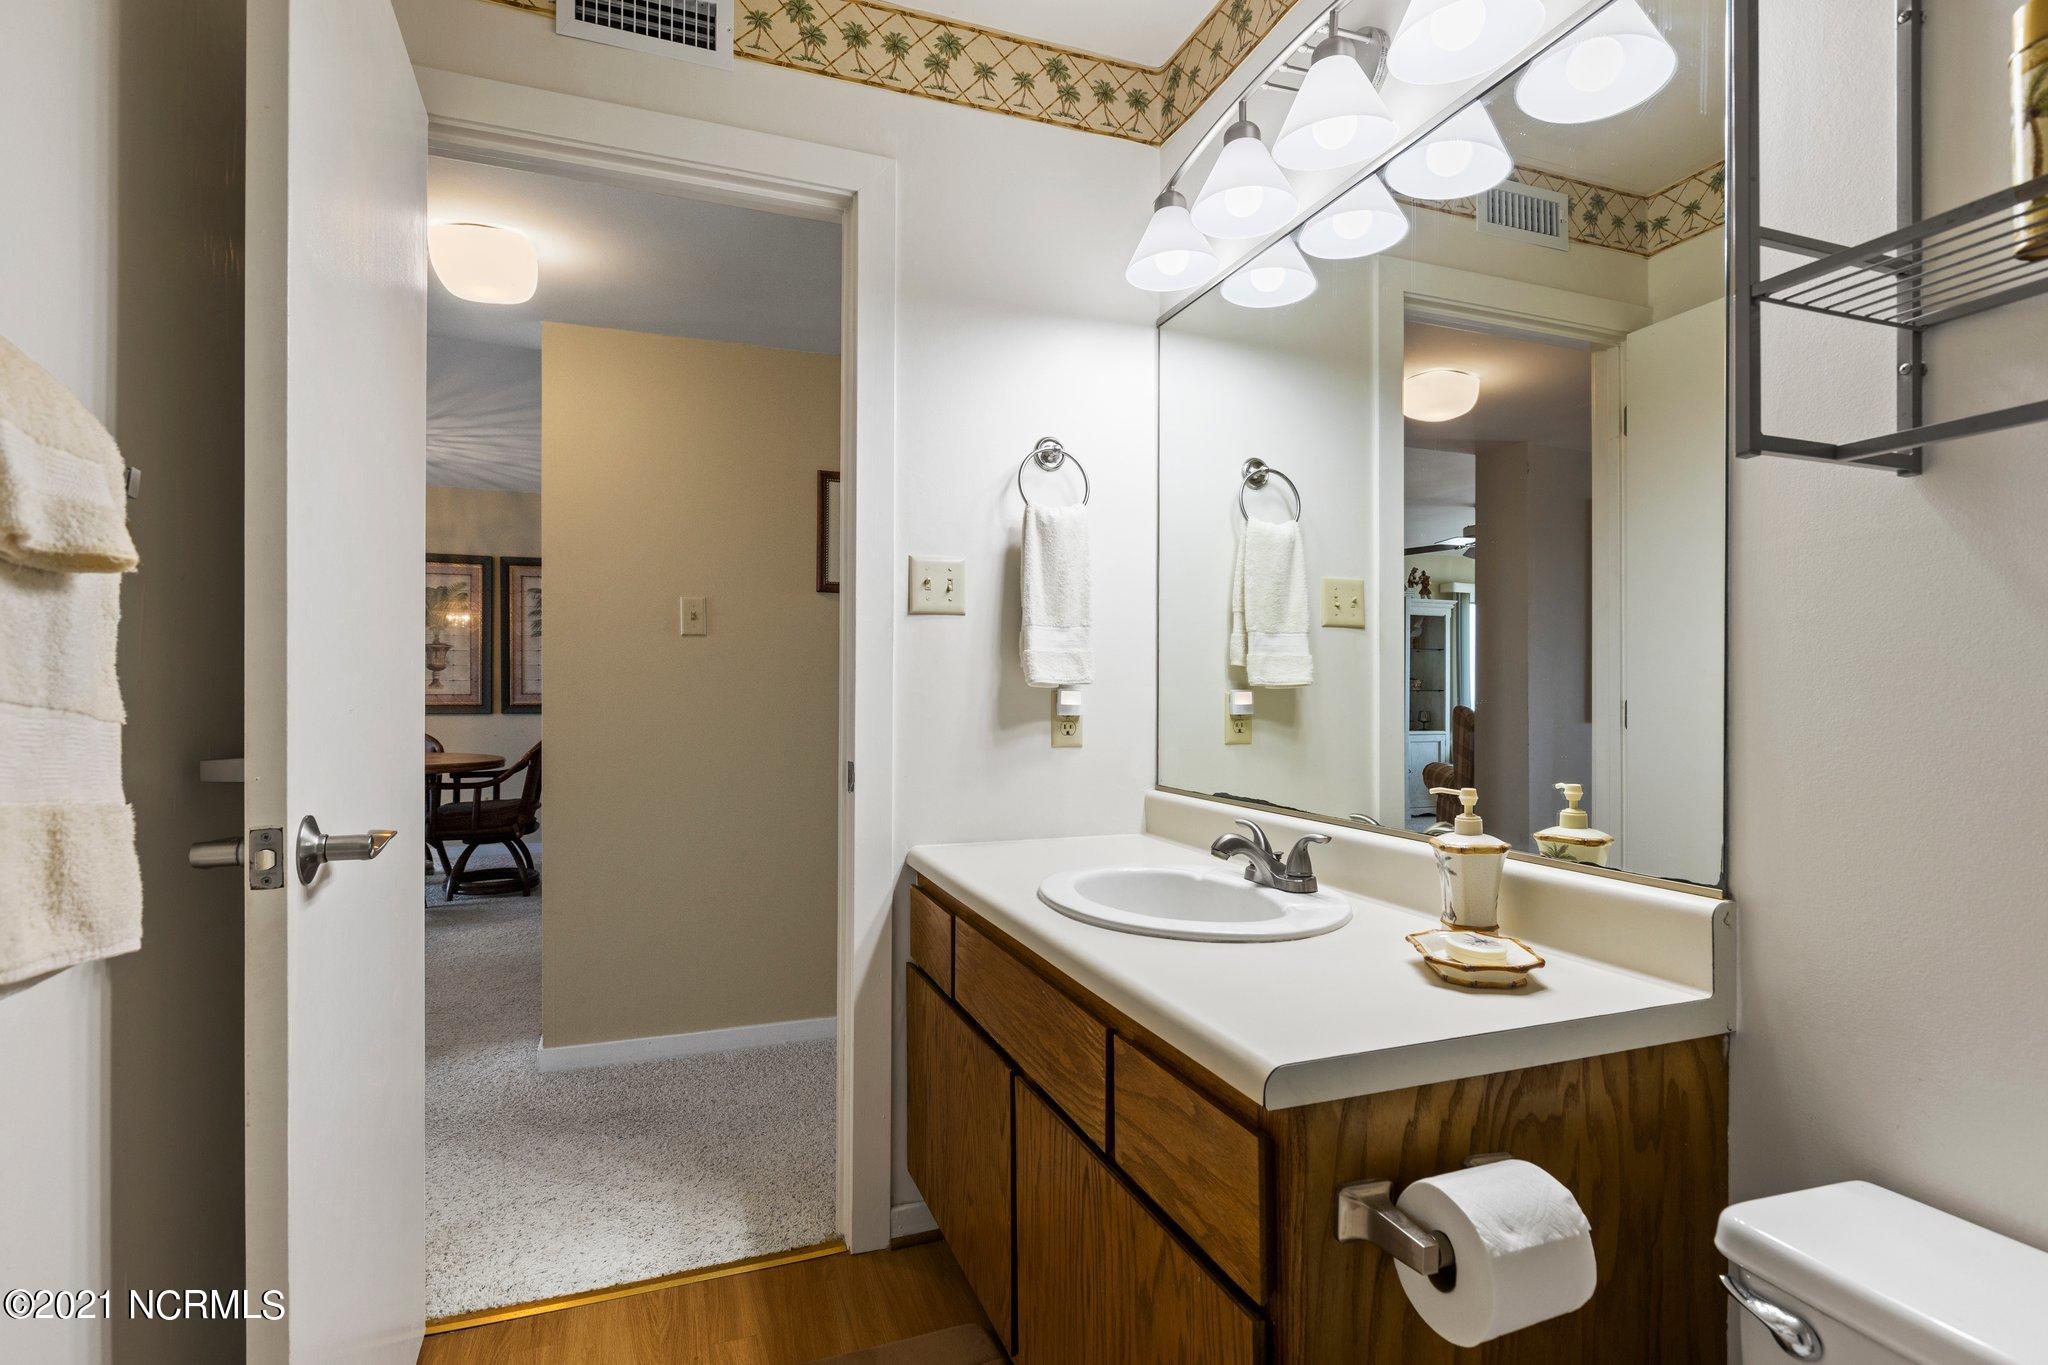 525 Salter Path Road, Pine Knoll Shores, North Carolina 28512, 2 Bedrooms Bedrooms, 4 Rooms Rooms,2 BathroomsBathrooms,Condominium,For sale,Salter Path,100285966